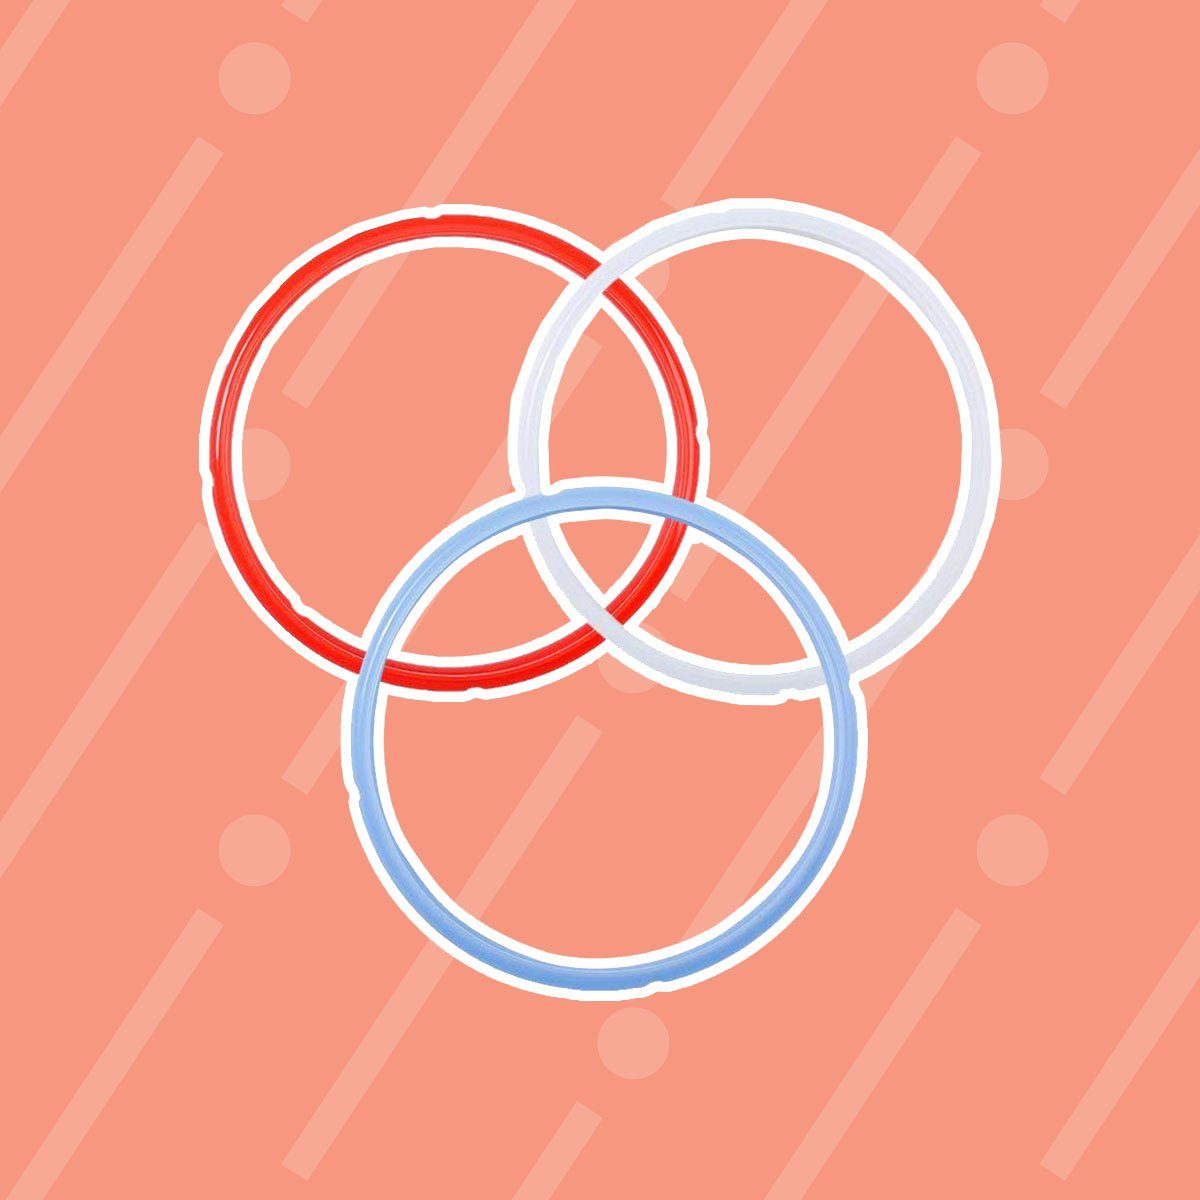 3 Pack Silicone Sealing Ring